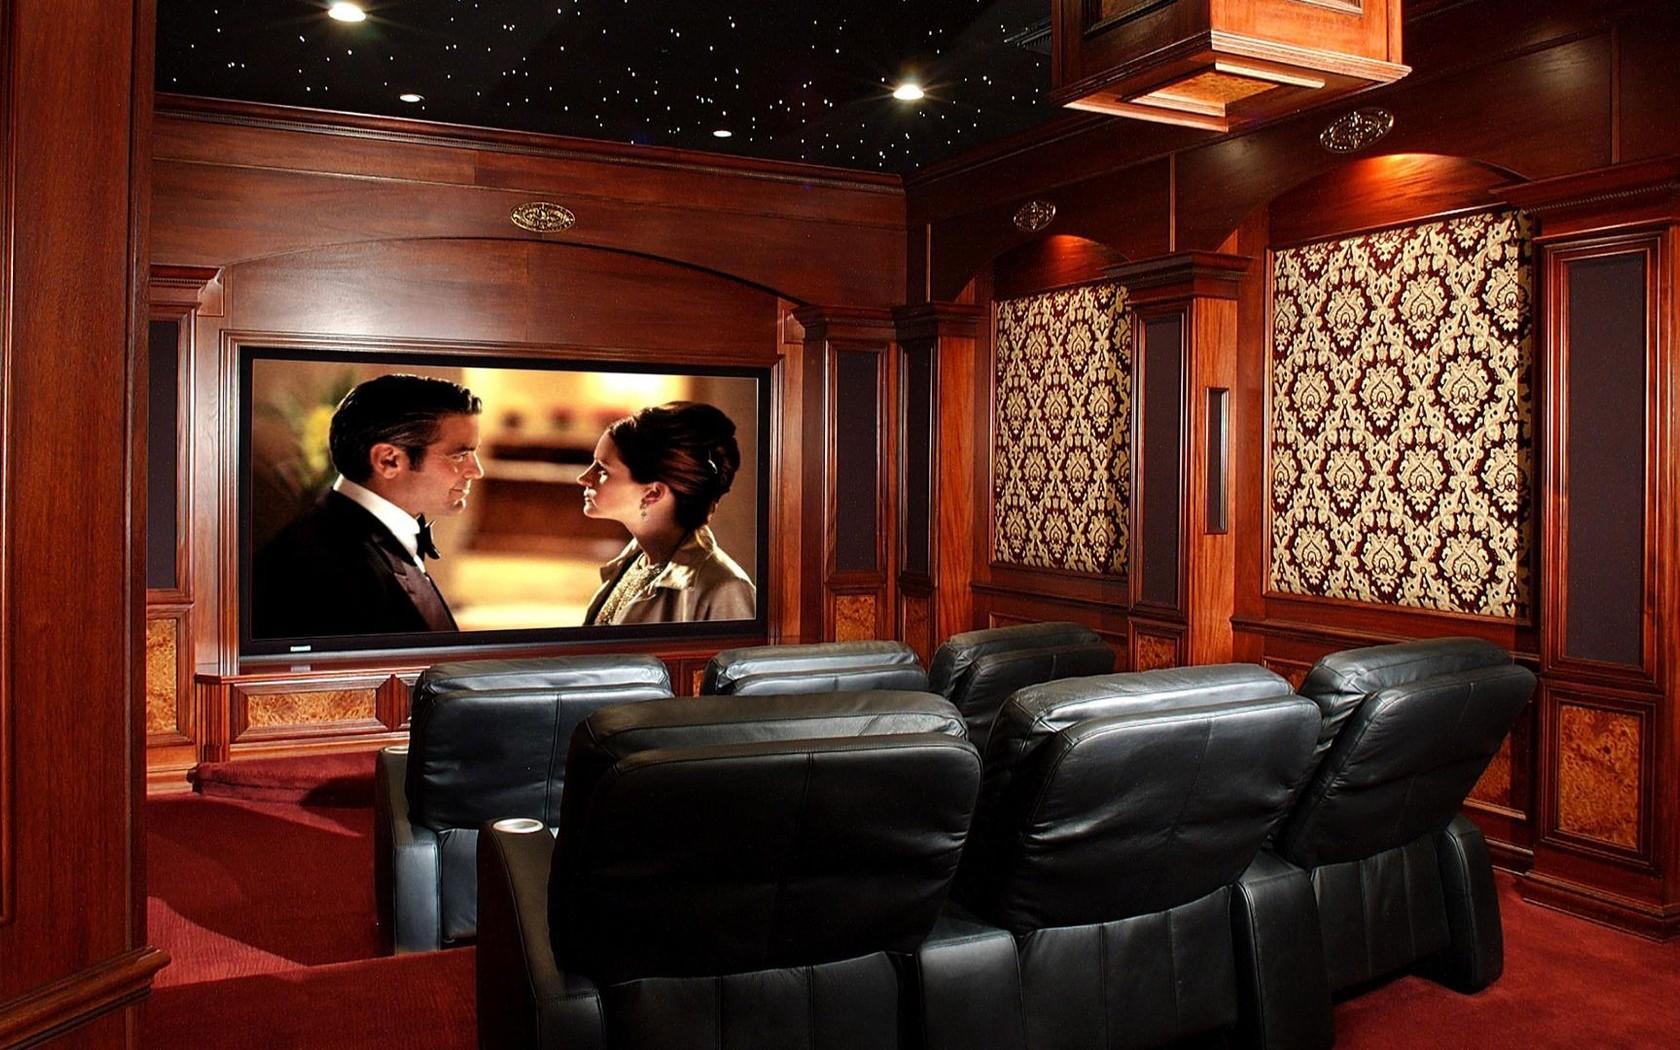 Home cinema wallpaper 8539 1680x1050